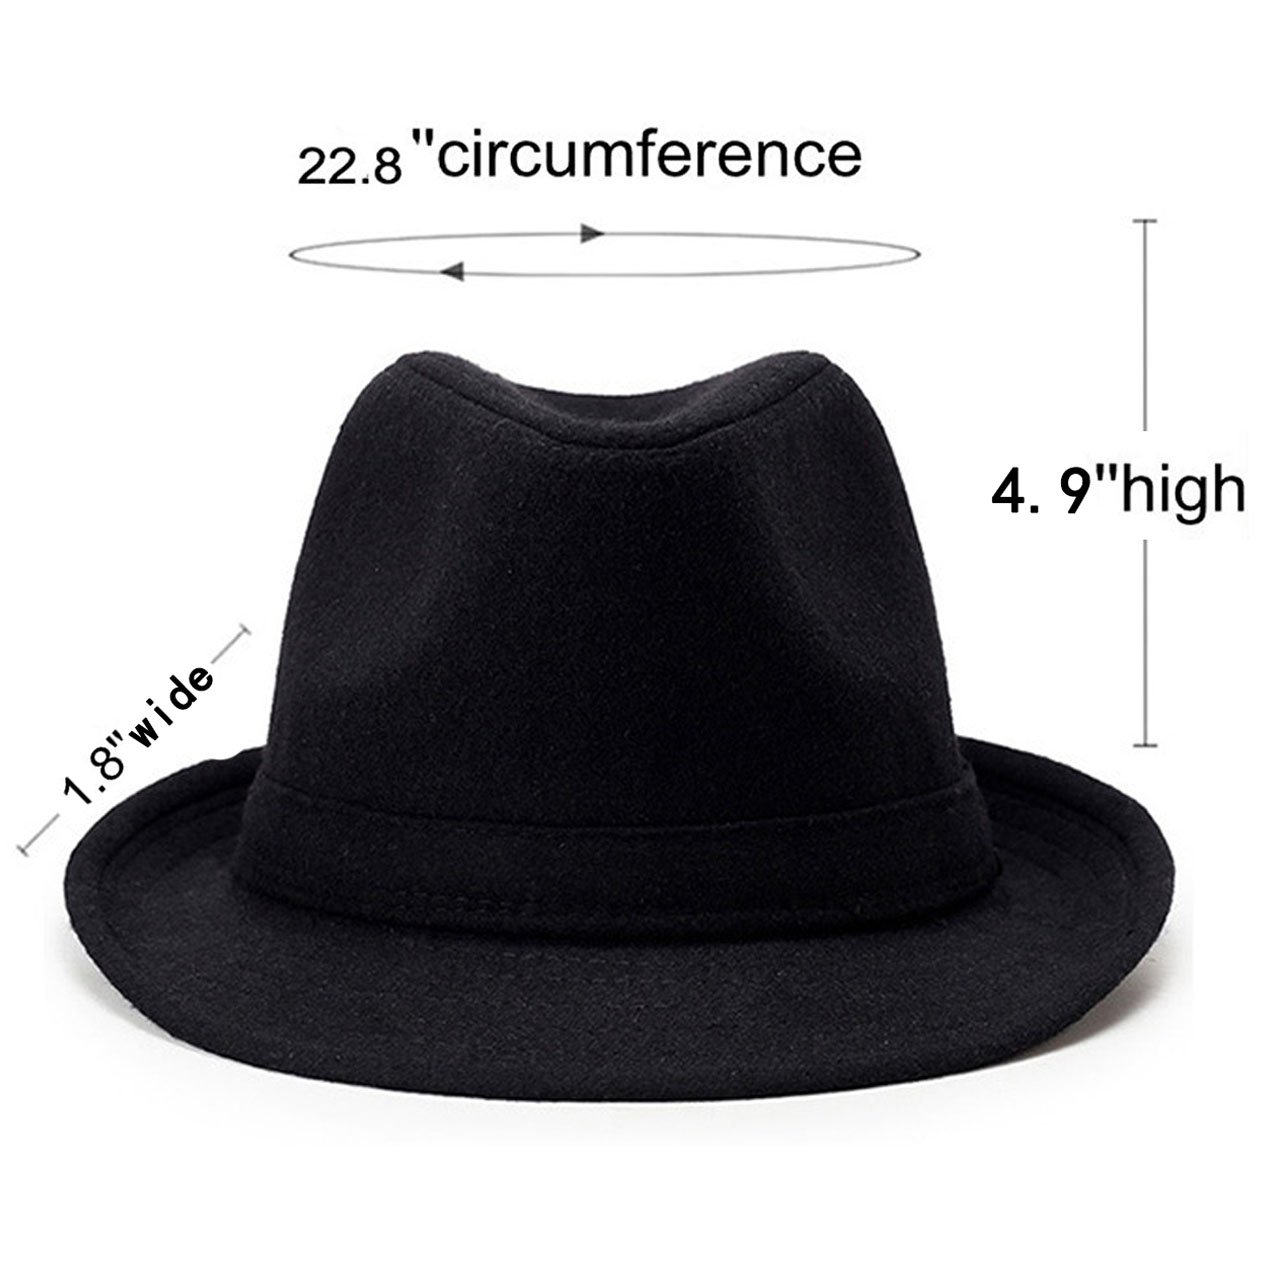 Unisex Classic Manhattan Fedora Hat Black Band Fashion Casual Jazz Wool Cap (Grey) by Faleto (Image #6)